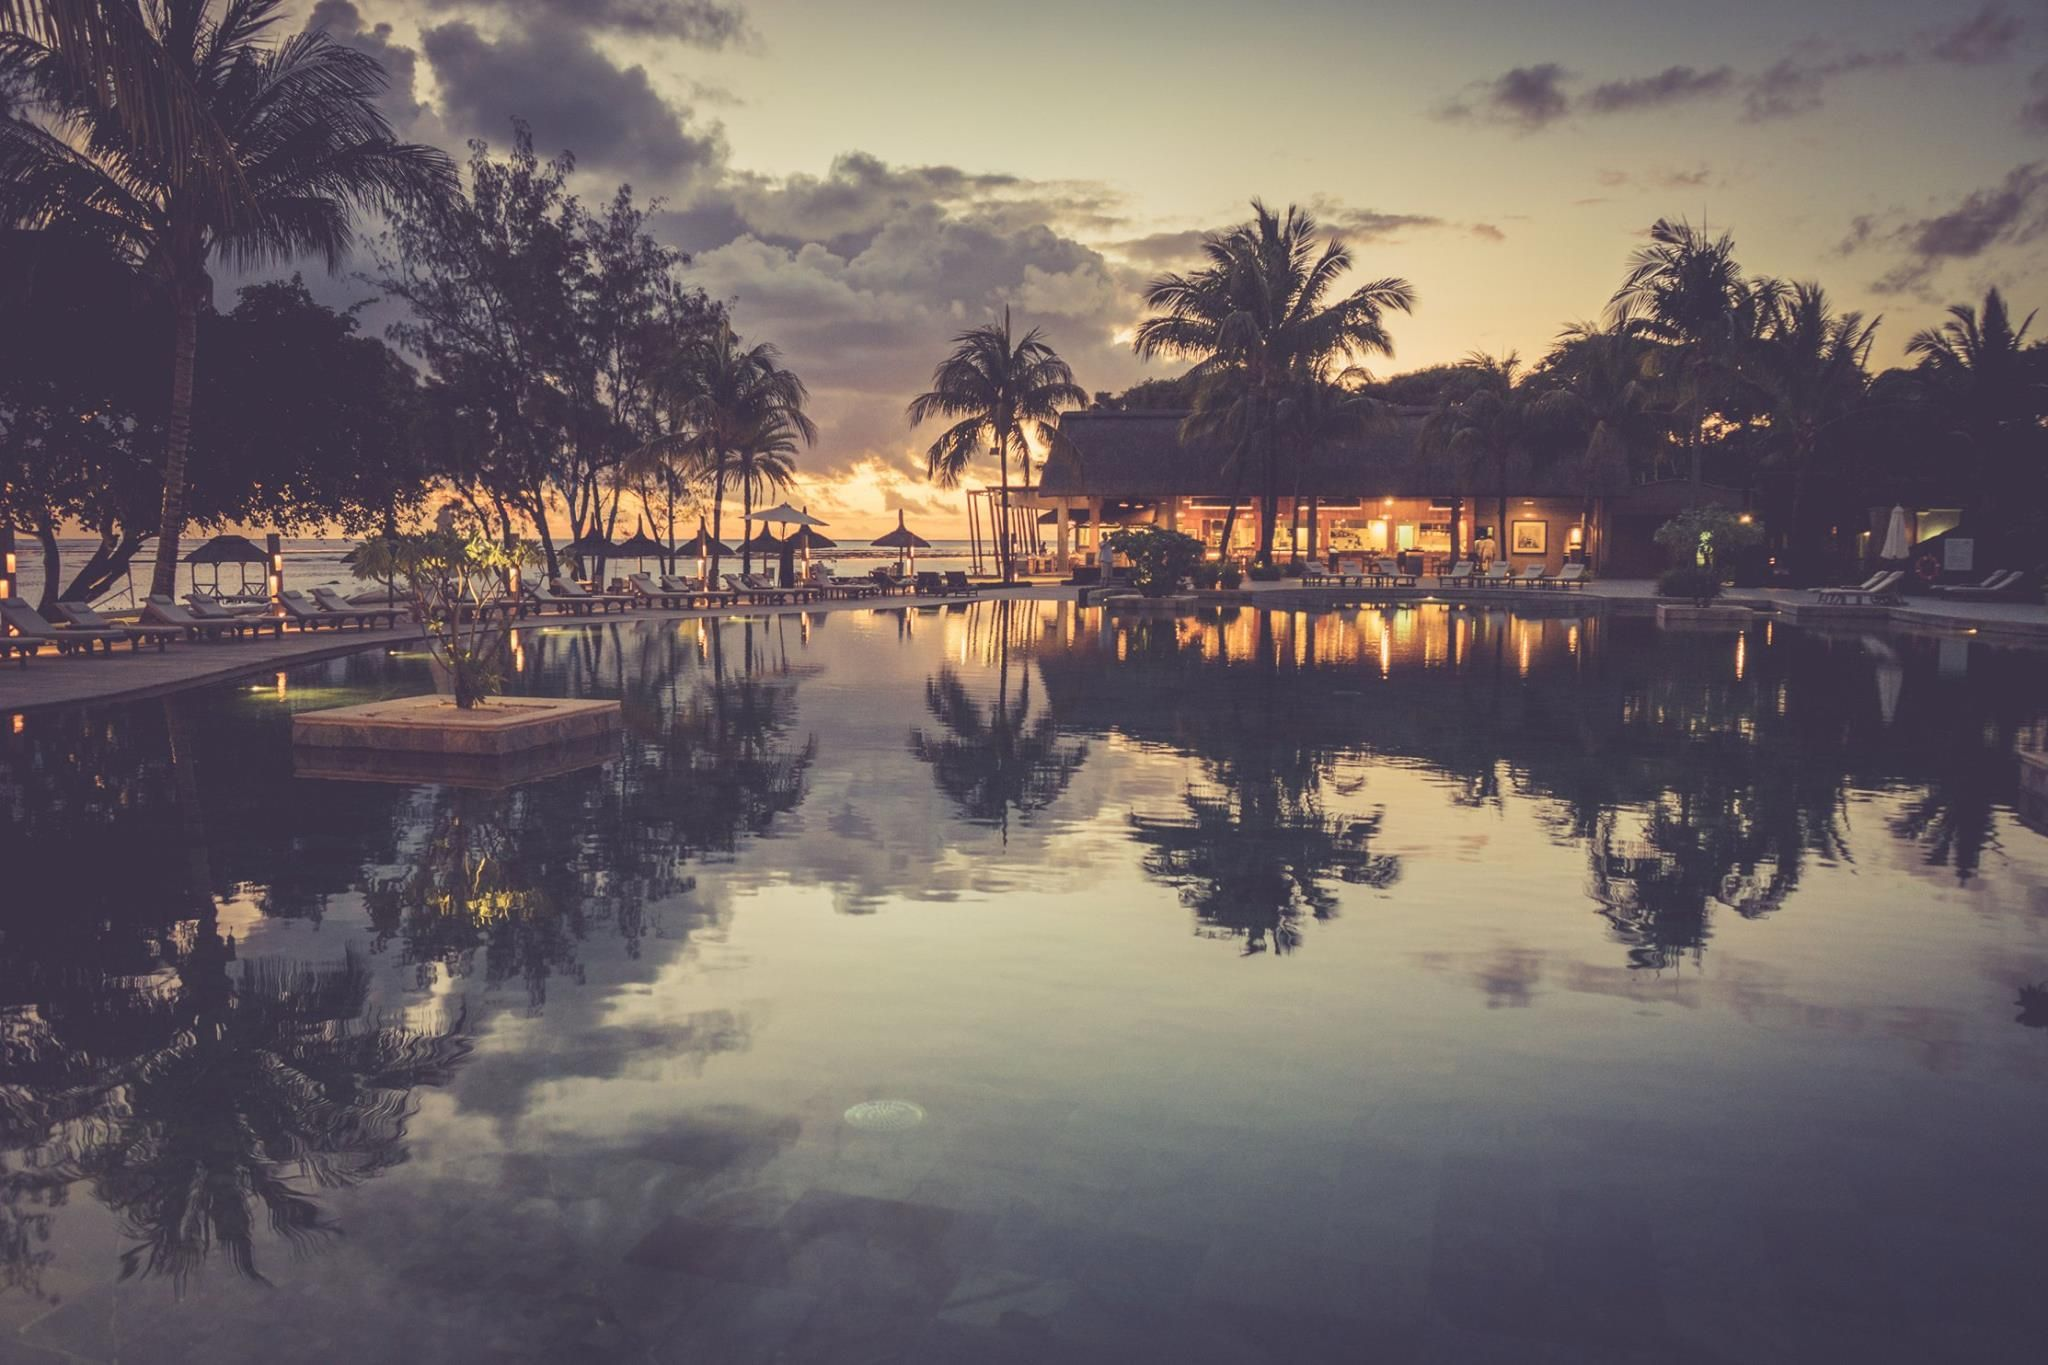 Outrigger Mauritius Beach Resort Mauritius Beach Beach Resorts Mauritius Resorts